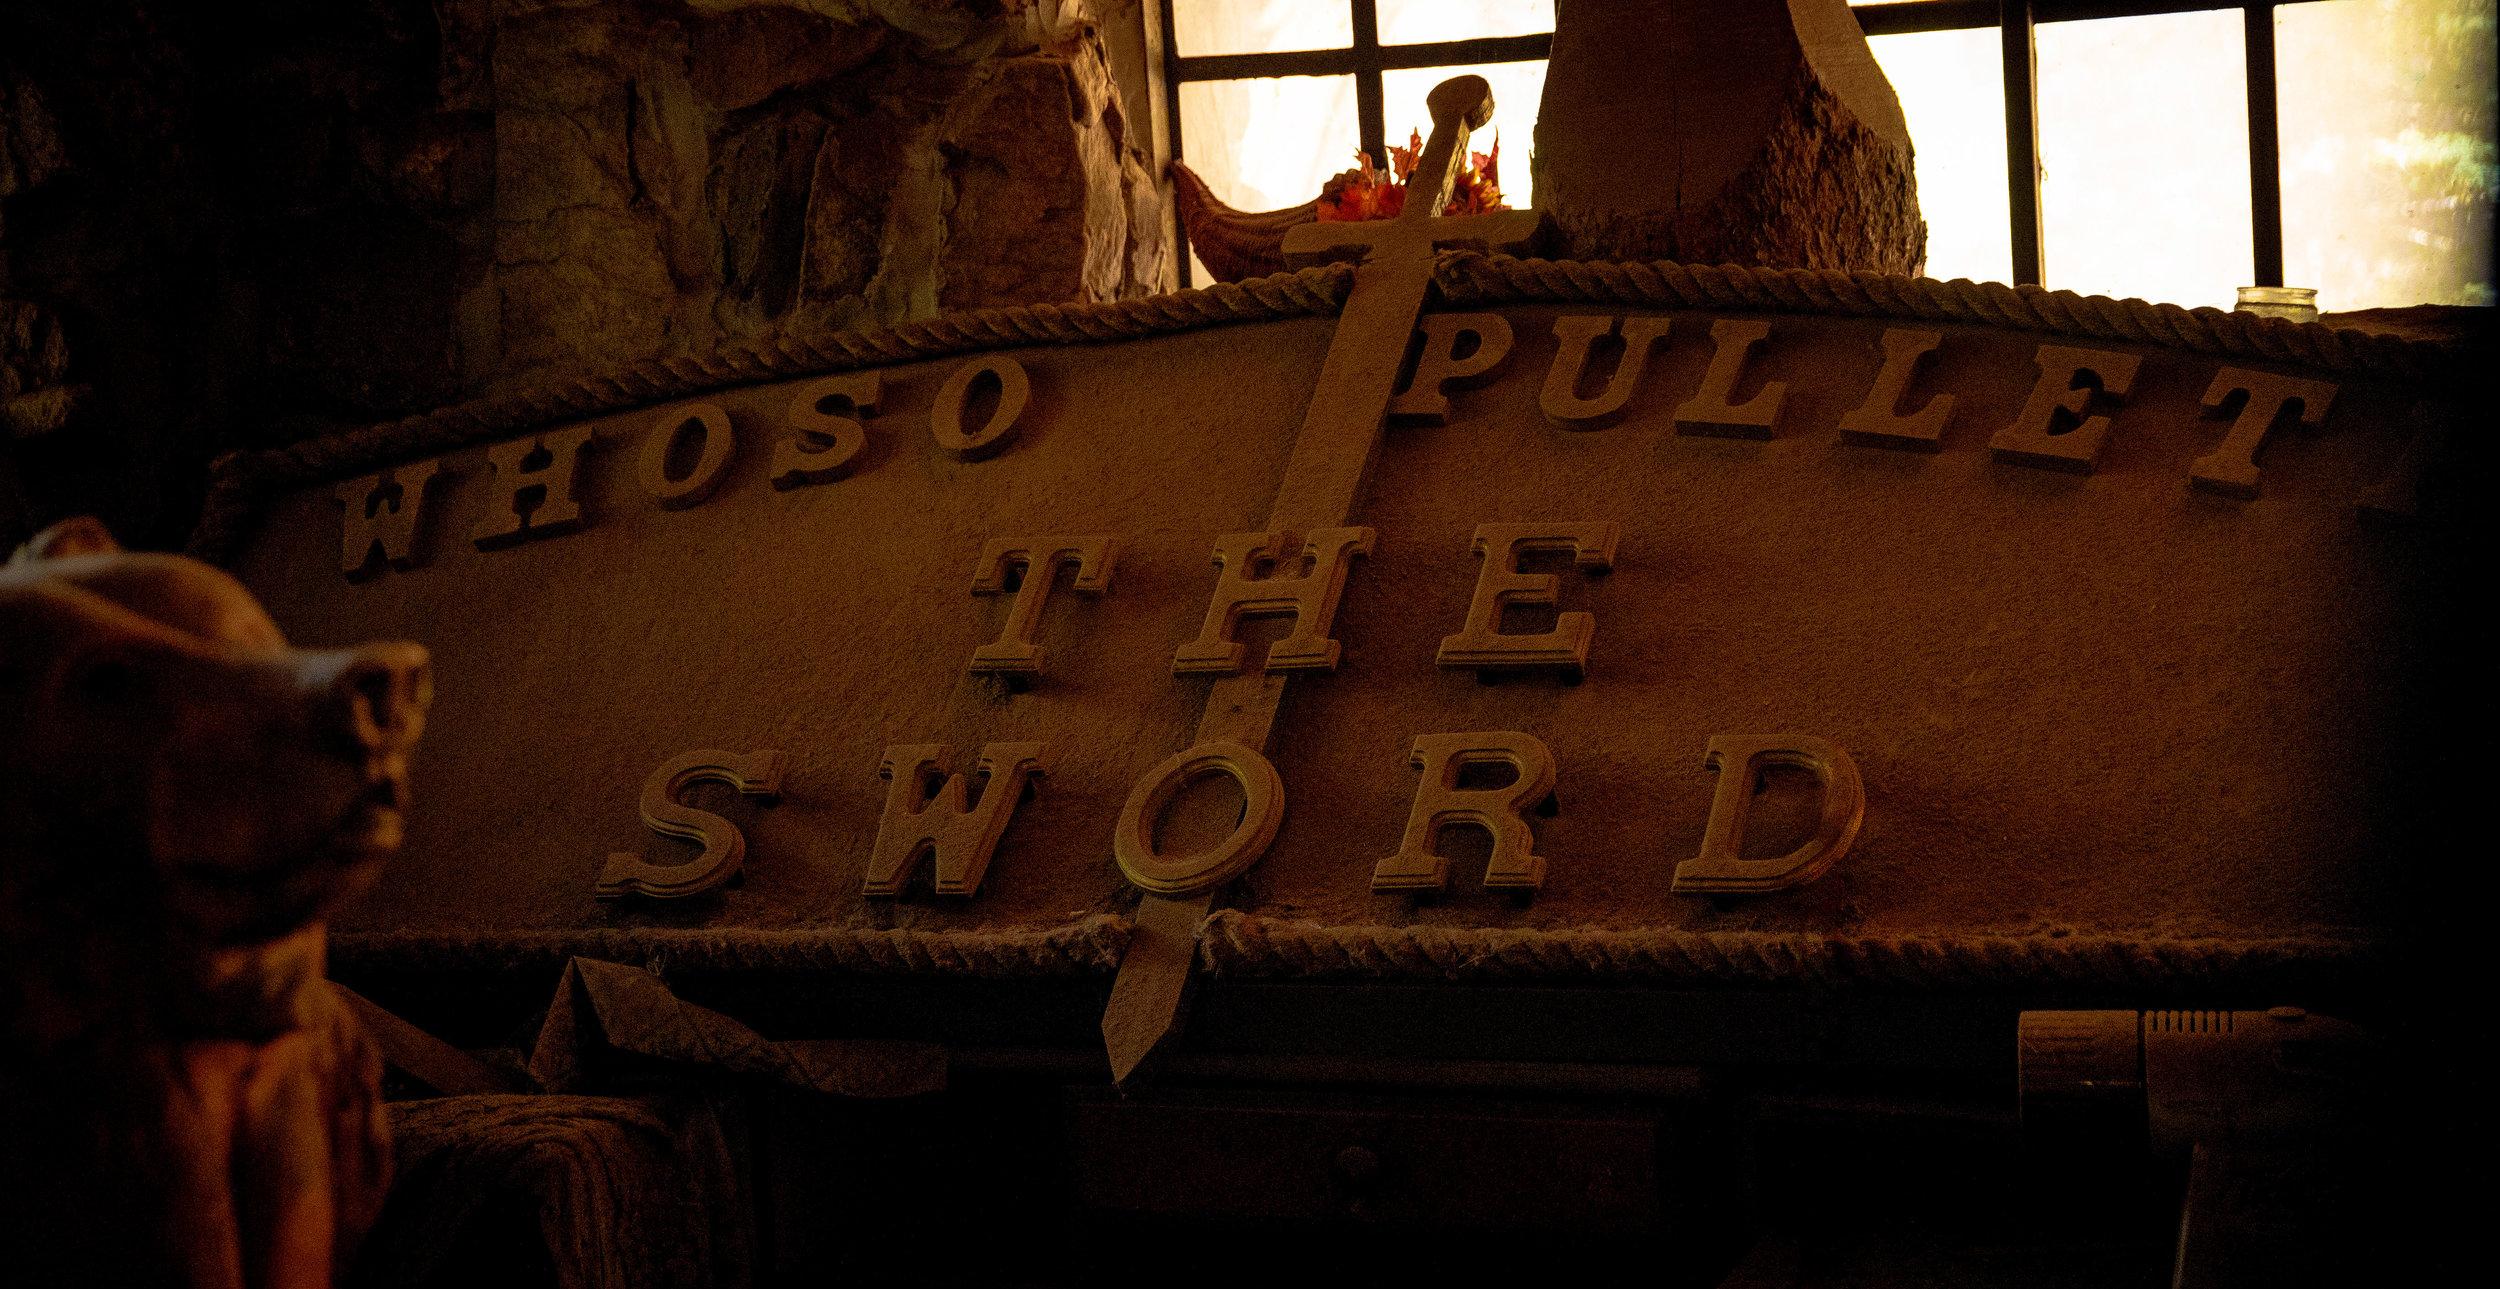 The Sword.jpg